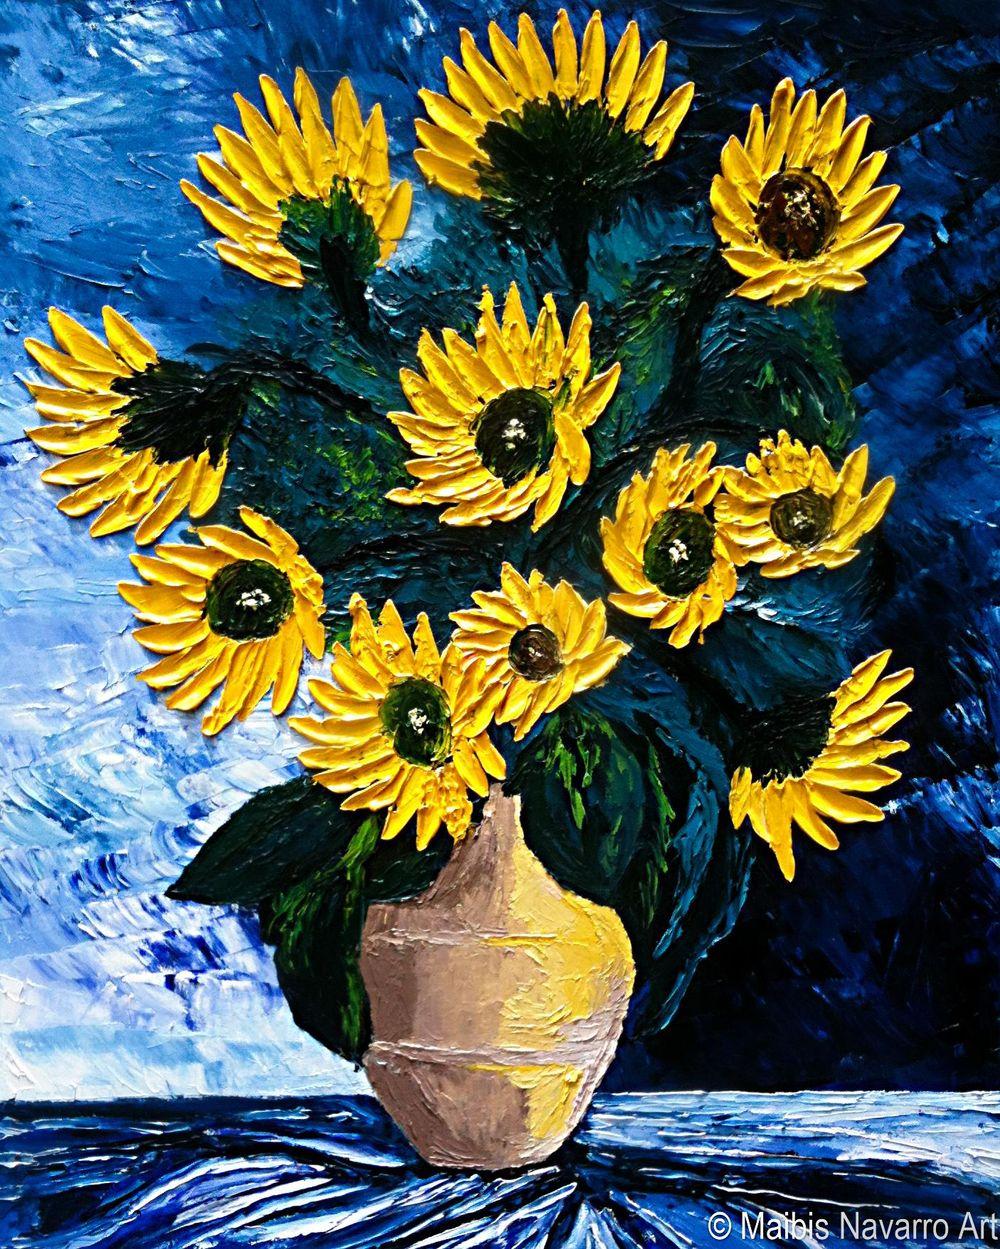 Floral Bouquet Sunflowers - image 1 - student project